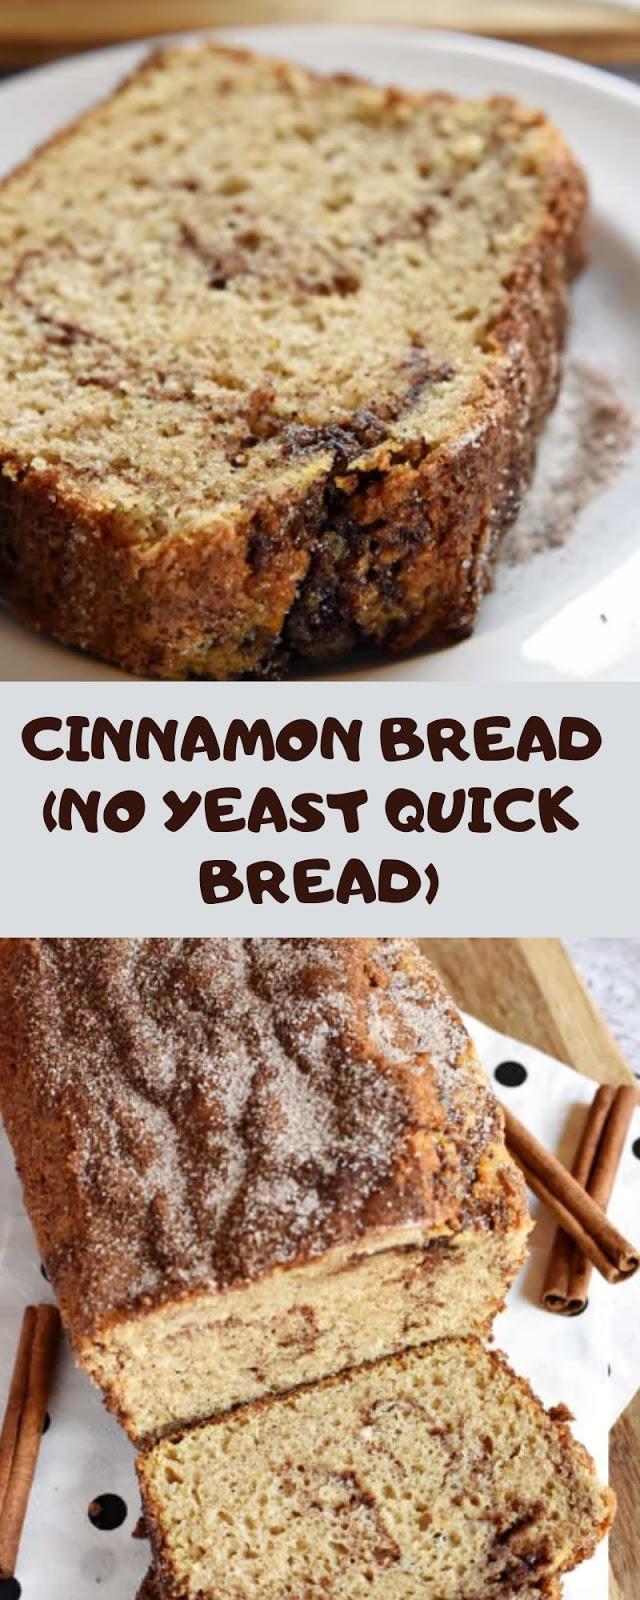 CINNAMON BREAD (NO YEAST QUICK BREAD)